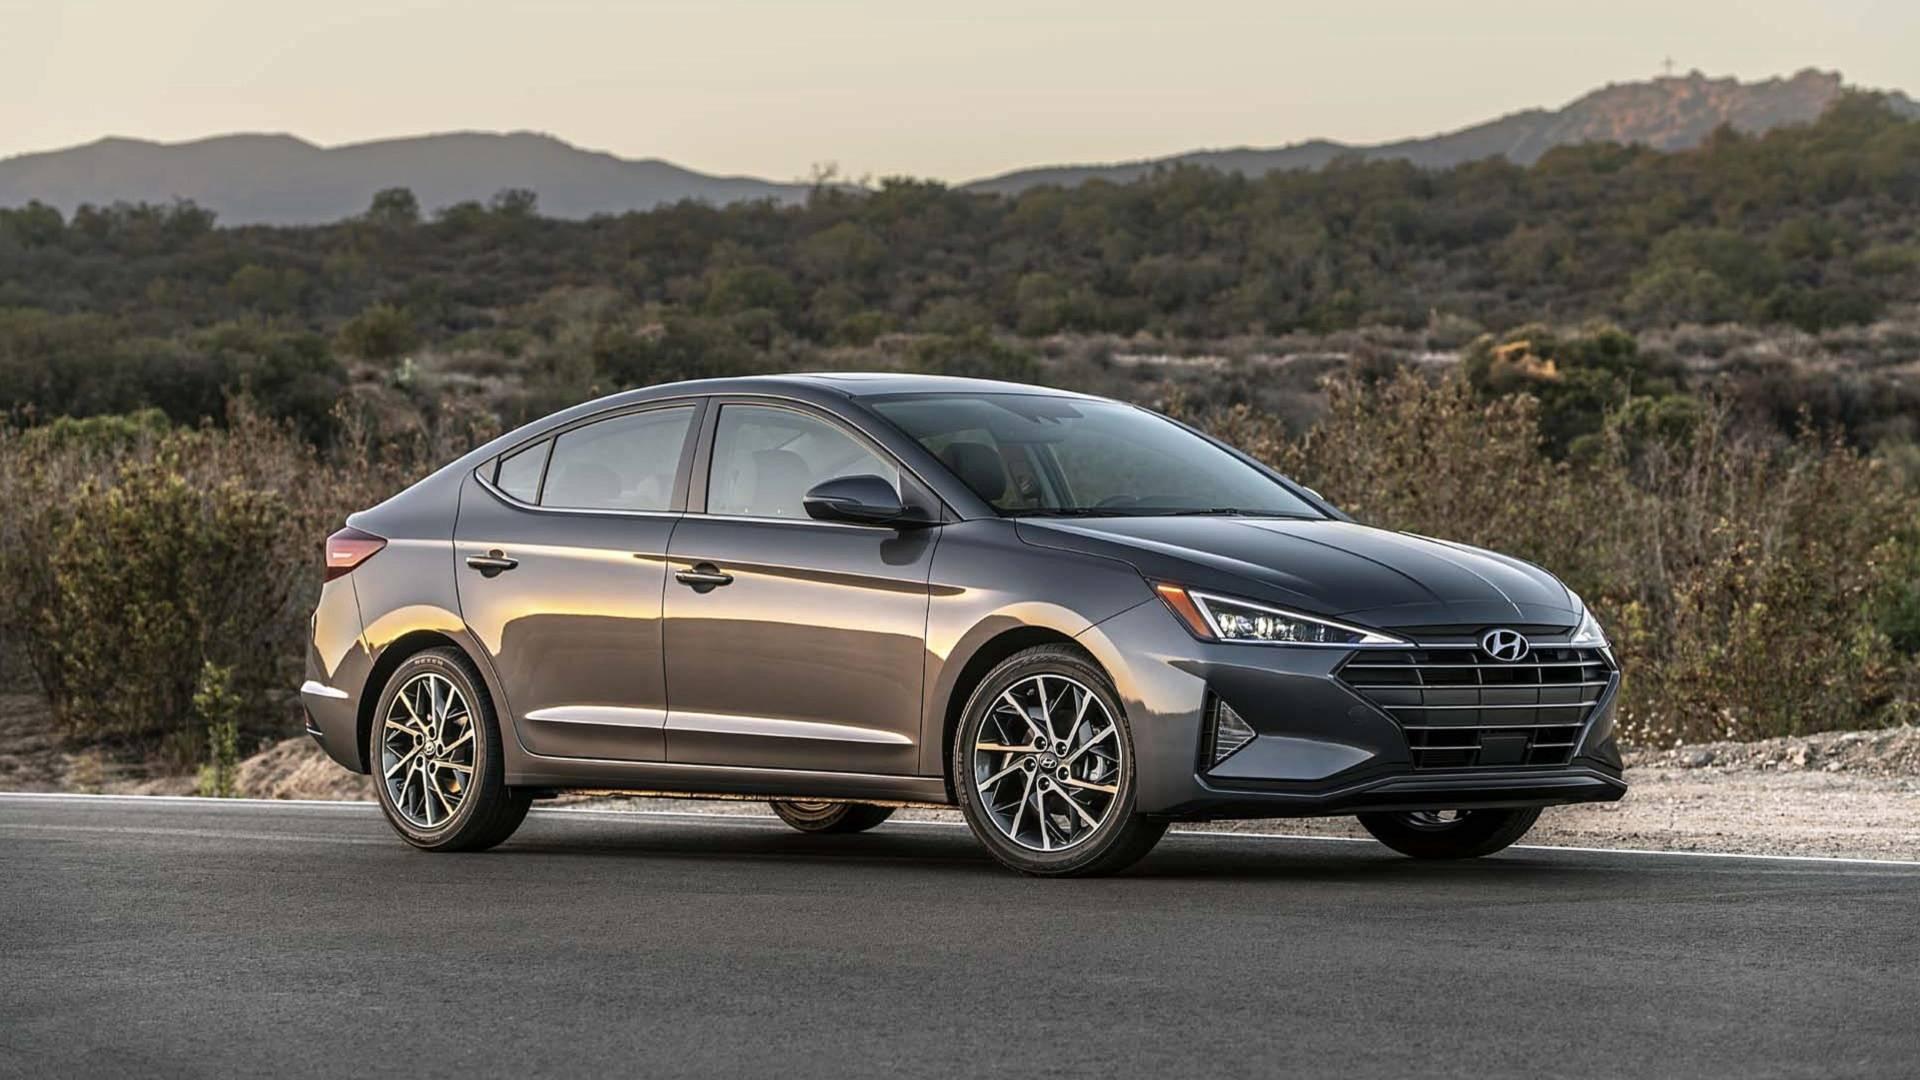 2019 Hyundai Elantra Is  150 More Expensive Than Previous Model Year